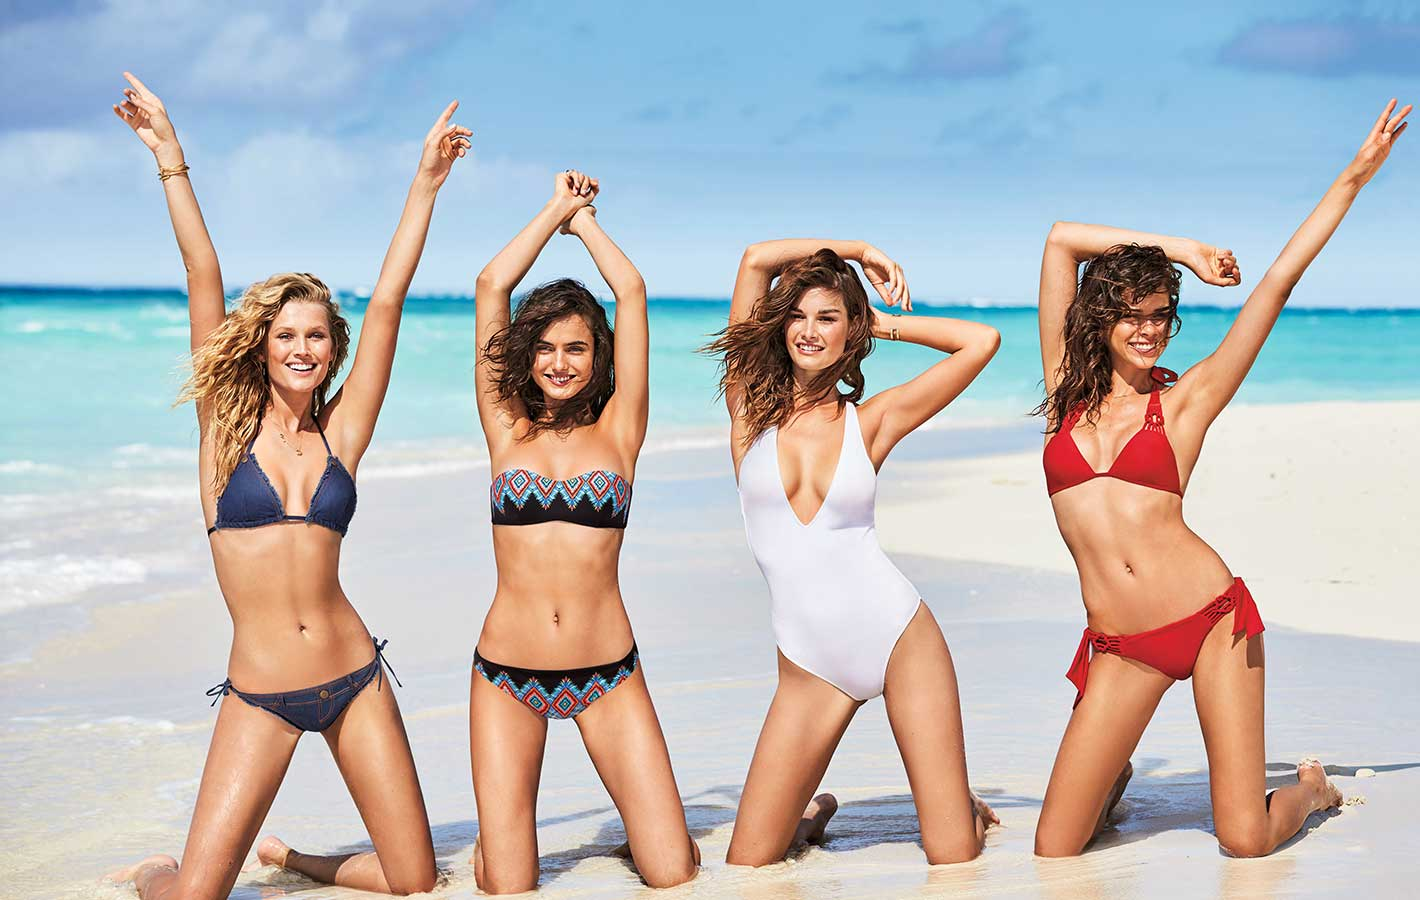 Gang modelek w nowej kampanii Calzedonia